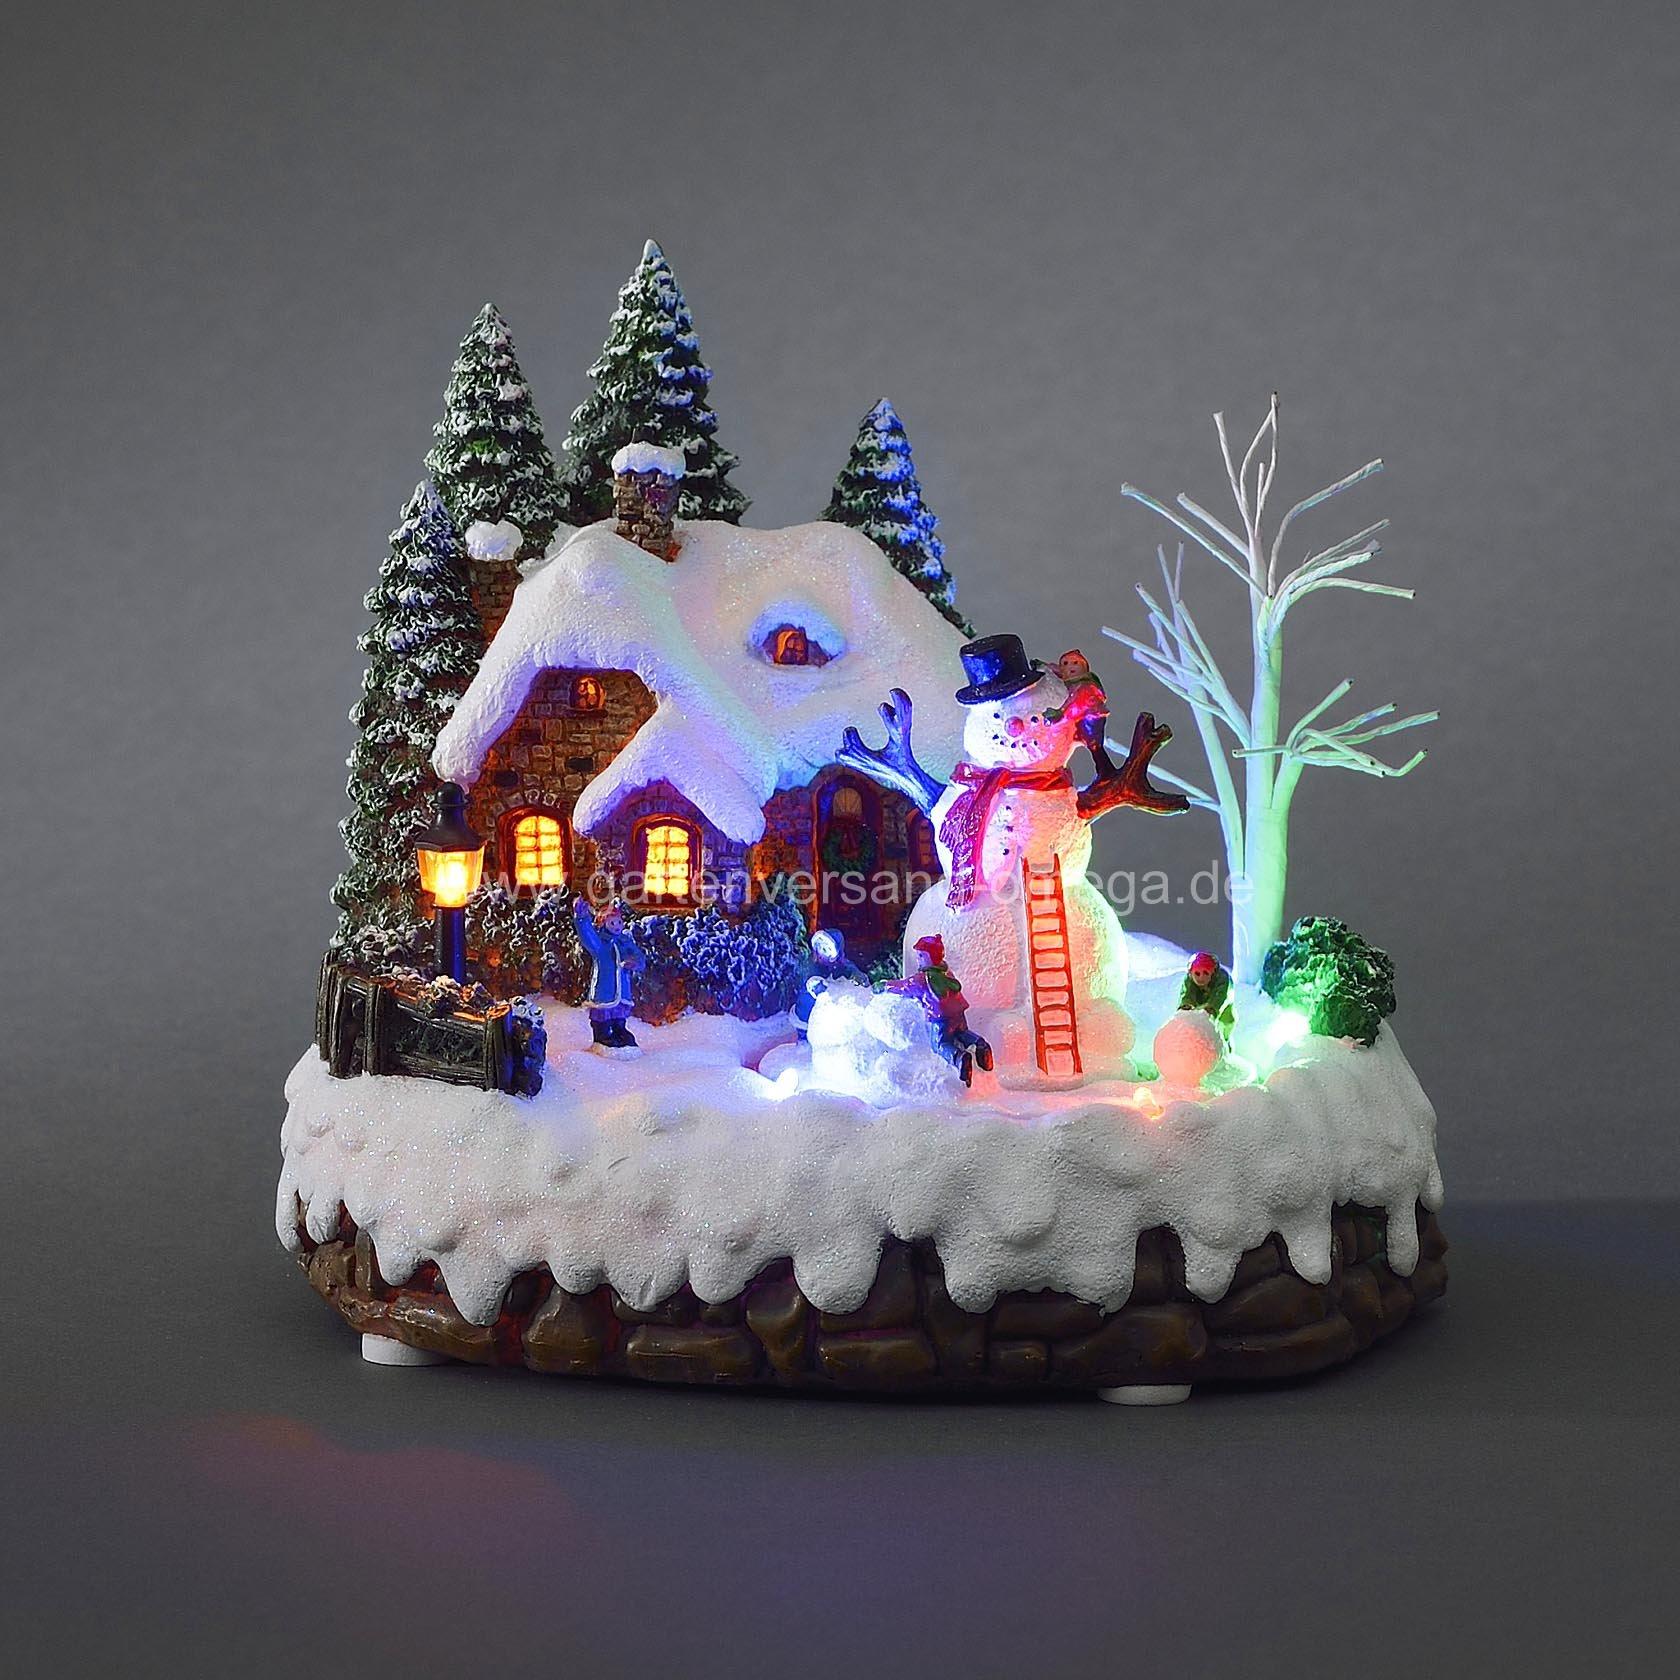 led dekoleuchte stern weihnachtsstern lichterstern dekostern 20 led 38 cm smash. Black Bedroom Furniture Sets. Home Design Ideas